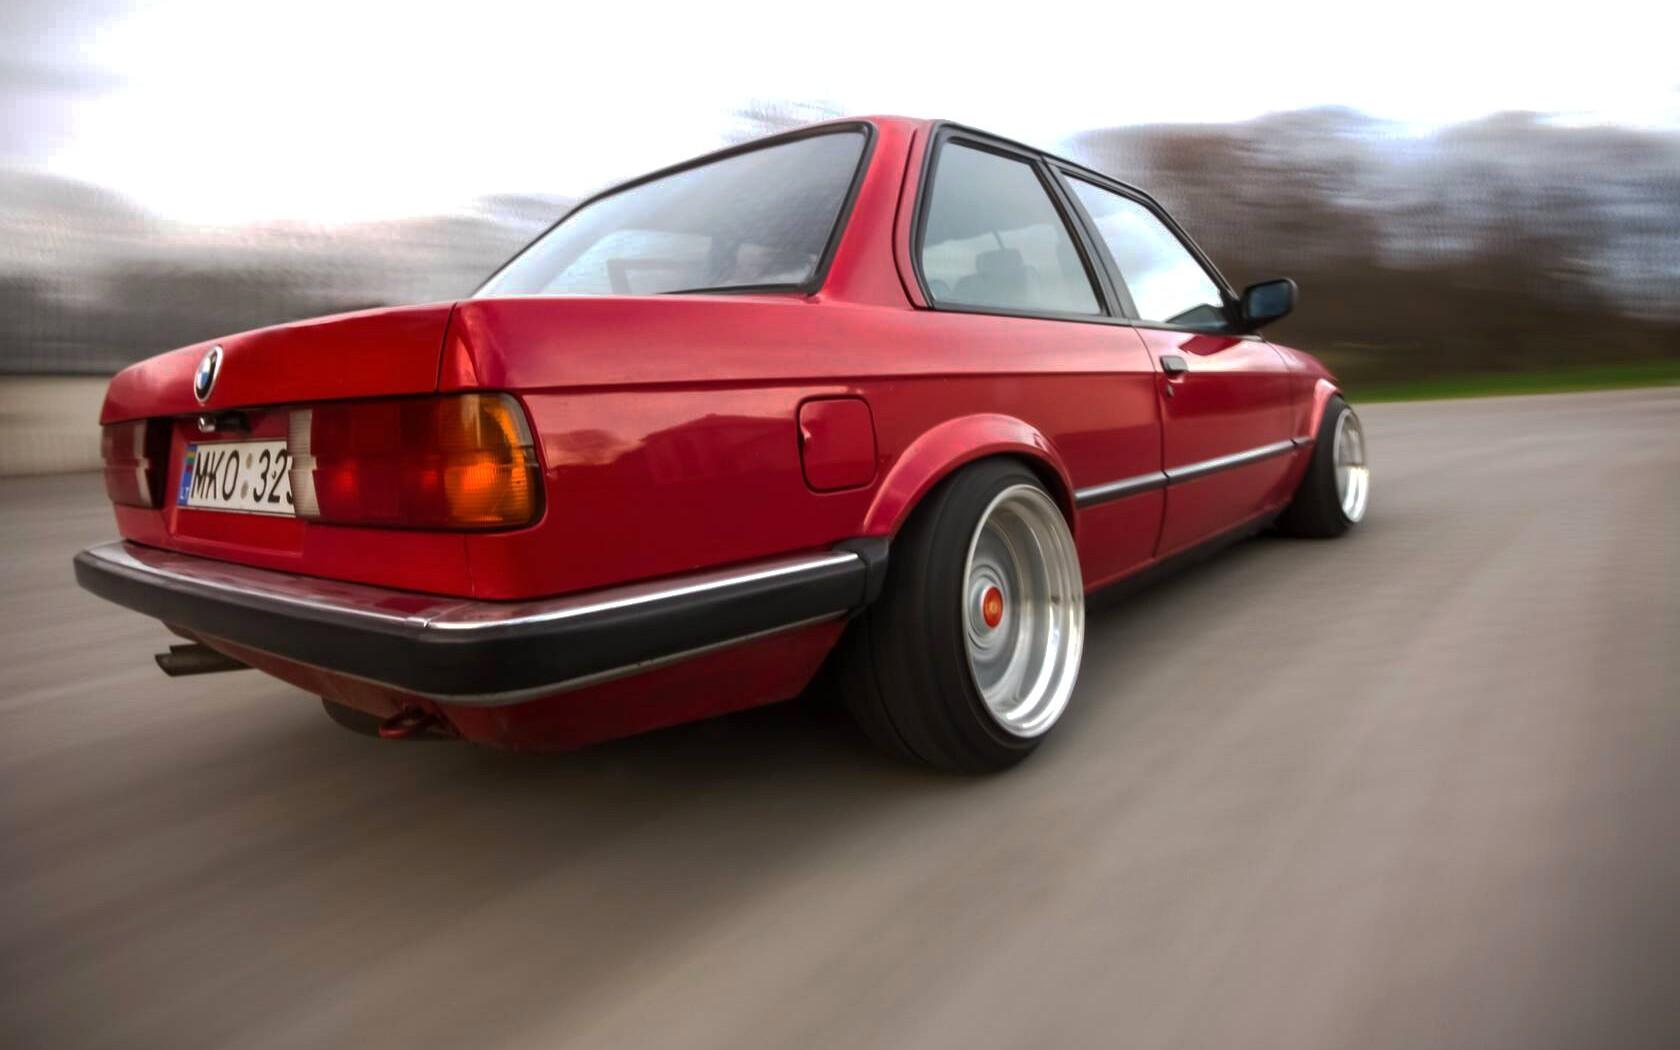 1680x1050 Bmw E30 Old Sport Car 1680x1050 Resolution Hd 4k